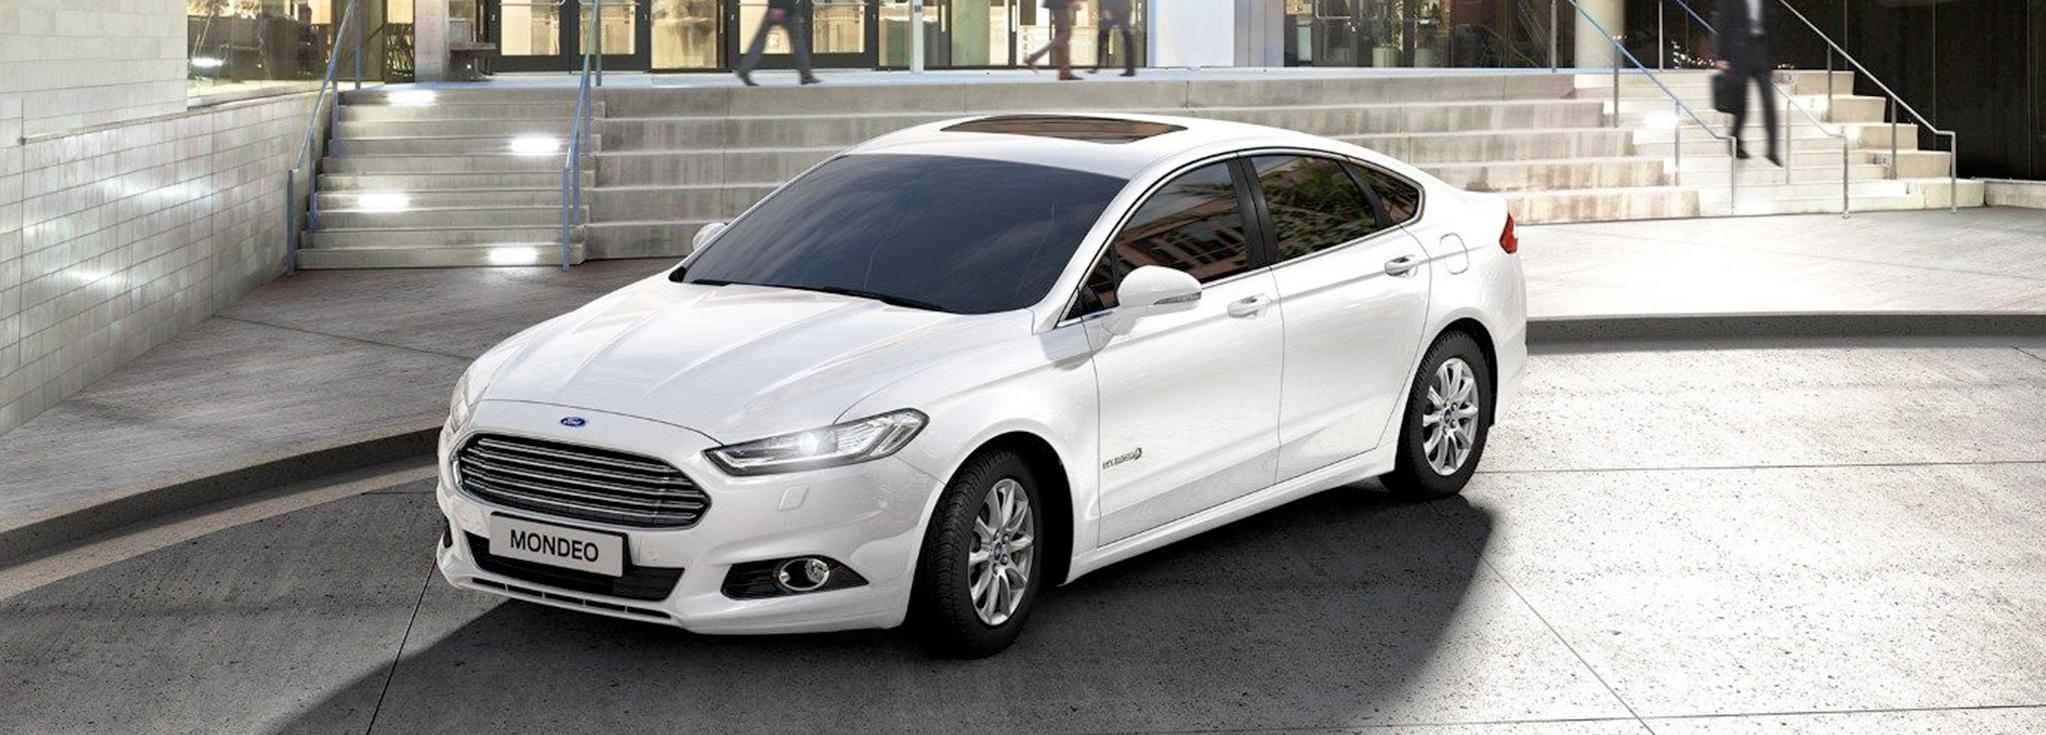 Exterior Ford Mondeo Híbrido